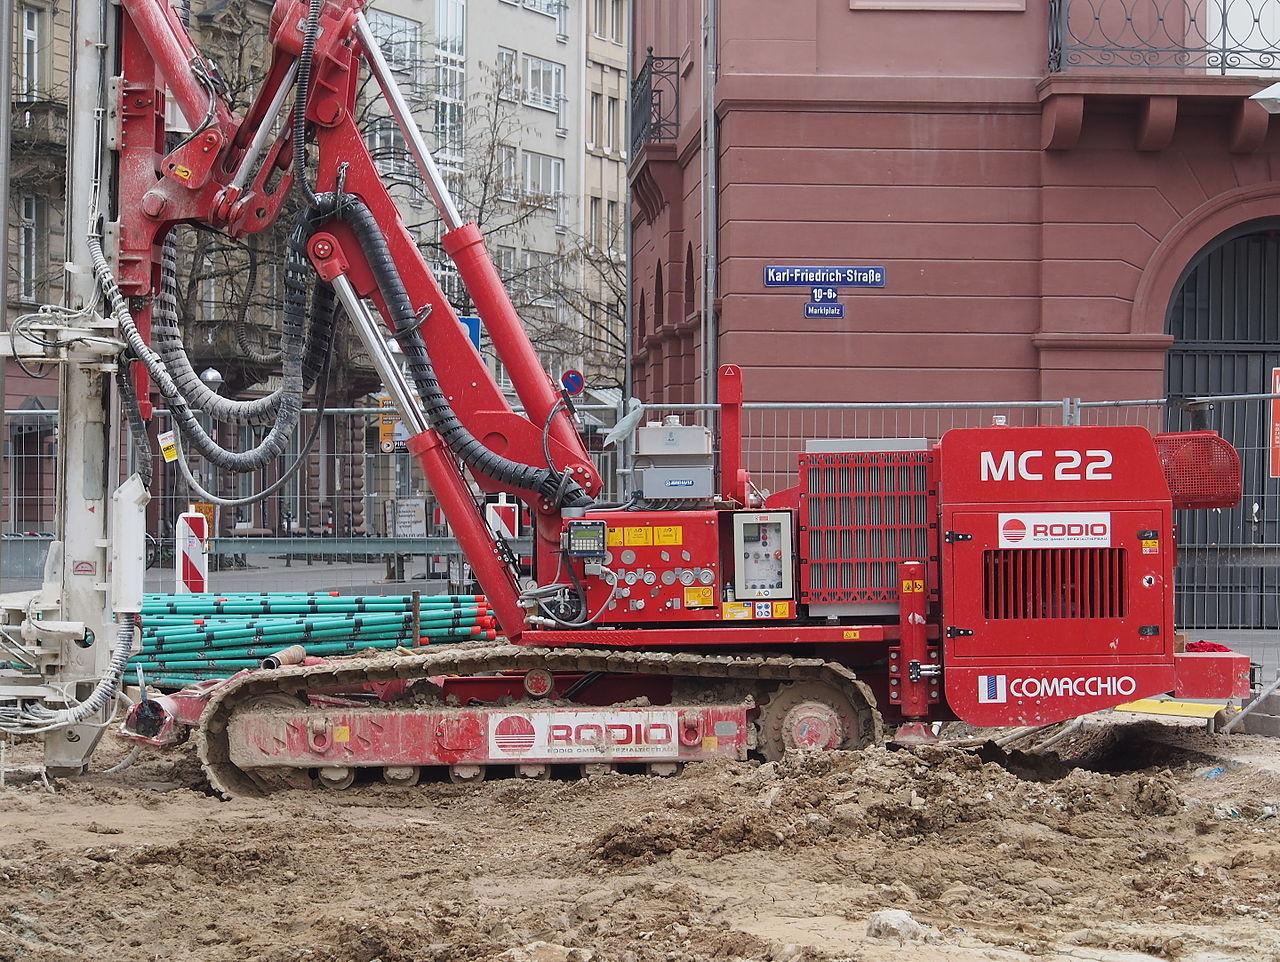 Comacchio MC22, Karlsruhe Bild 2.JPG